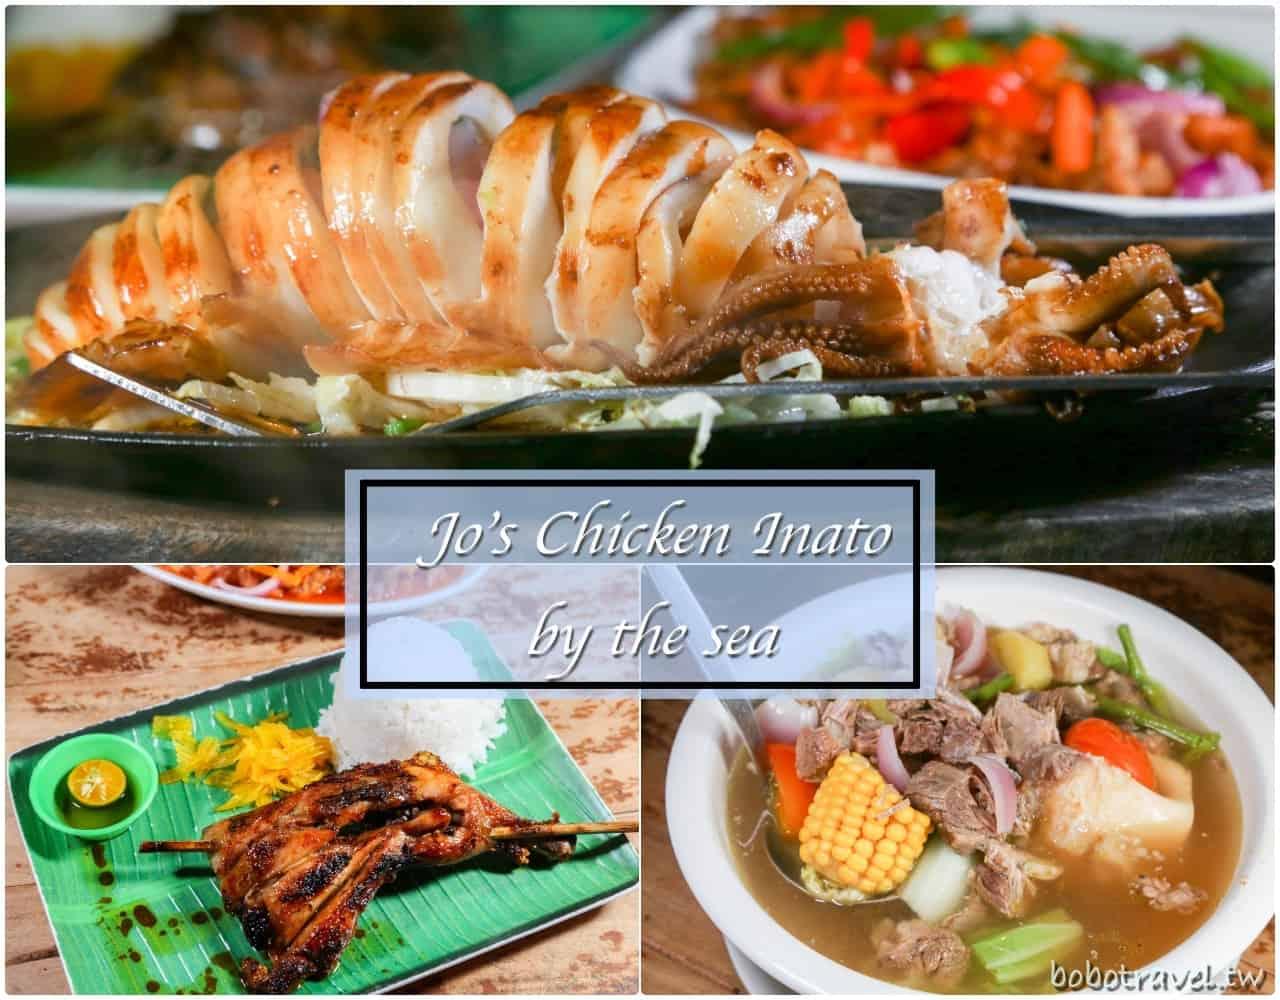 Dumaguete杜馬蓋地美食|傳統菲律賓海鮮料理 Jo's Chicken Inato – Sibulan,必吃菲式烤雞腿